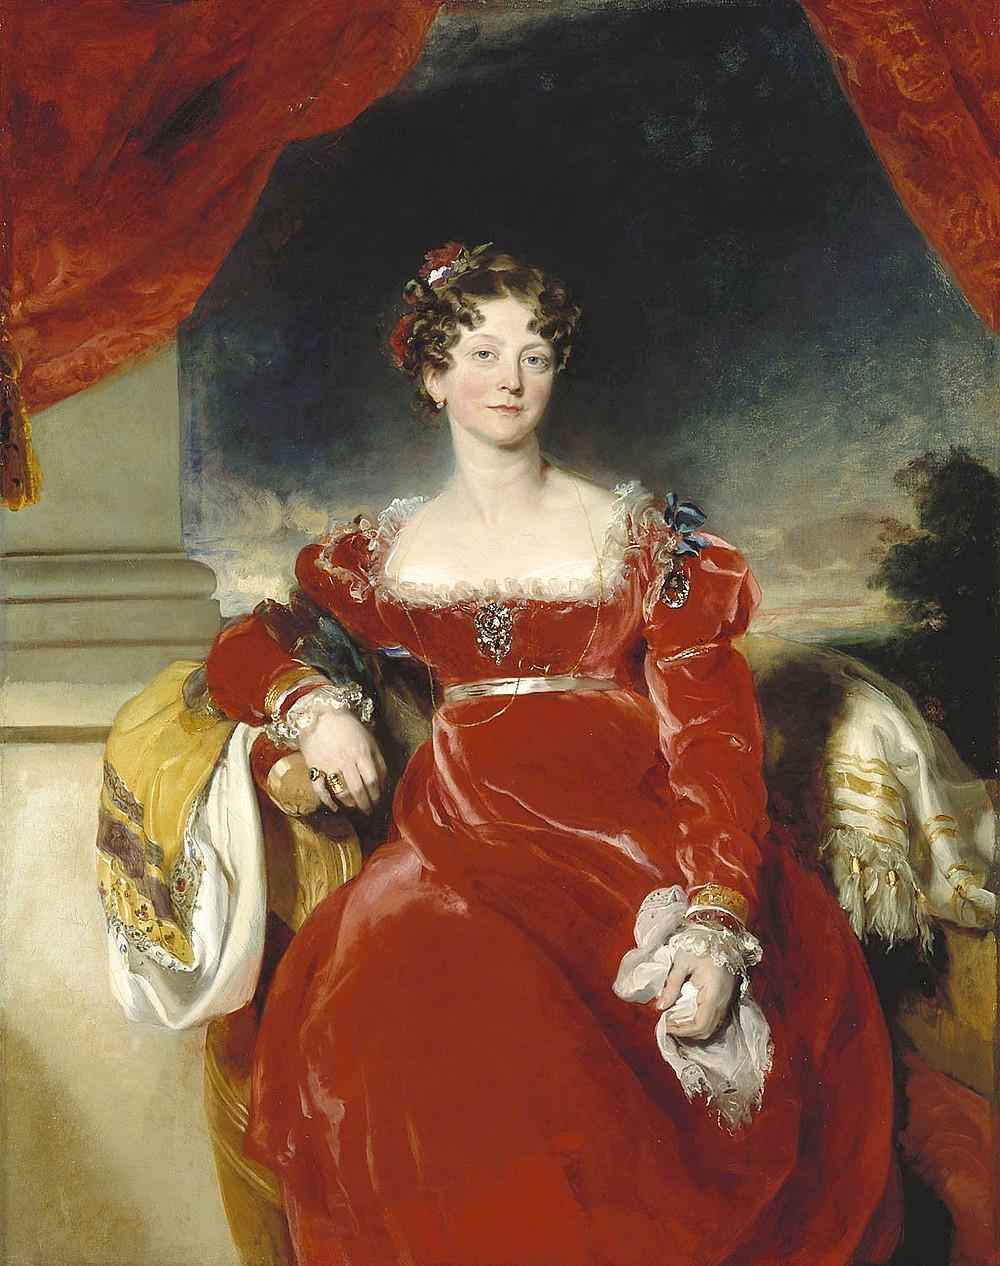 Princess Sophia portrait by Thomas Lawrence, daughter of George III